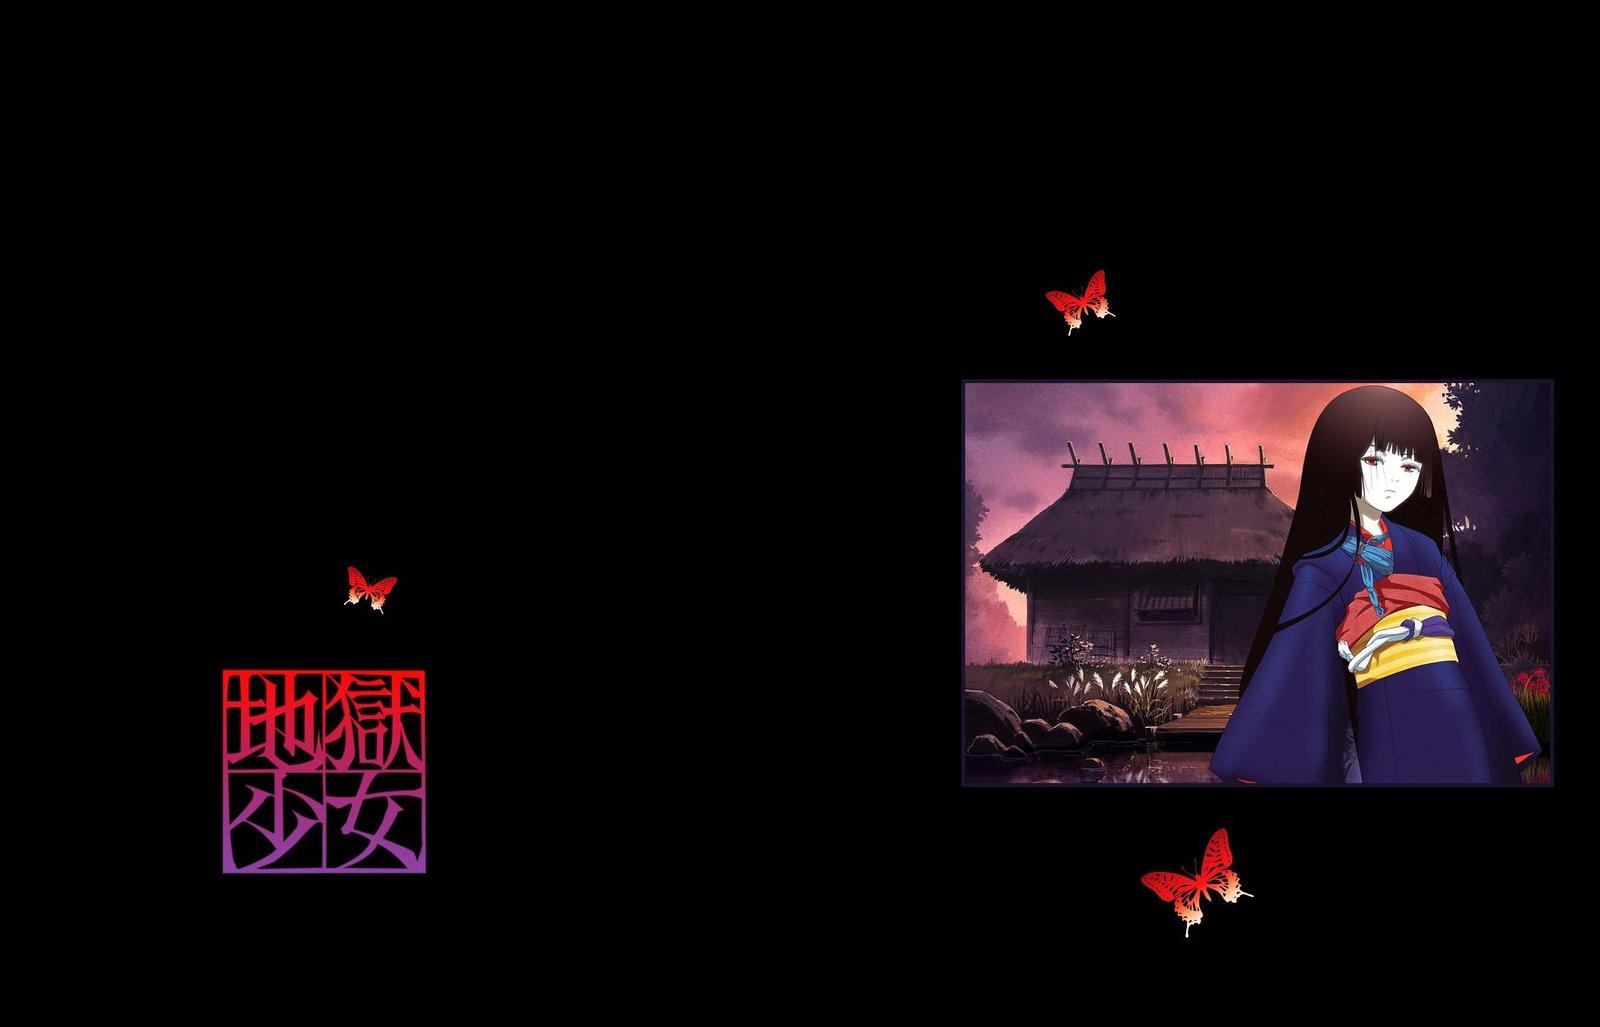 hell girl enma ai wallpaper 10 by shaluXangel 1600x1027